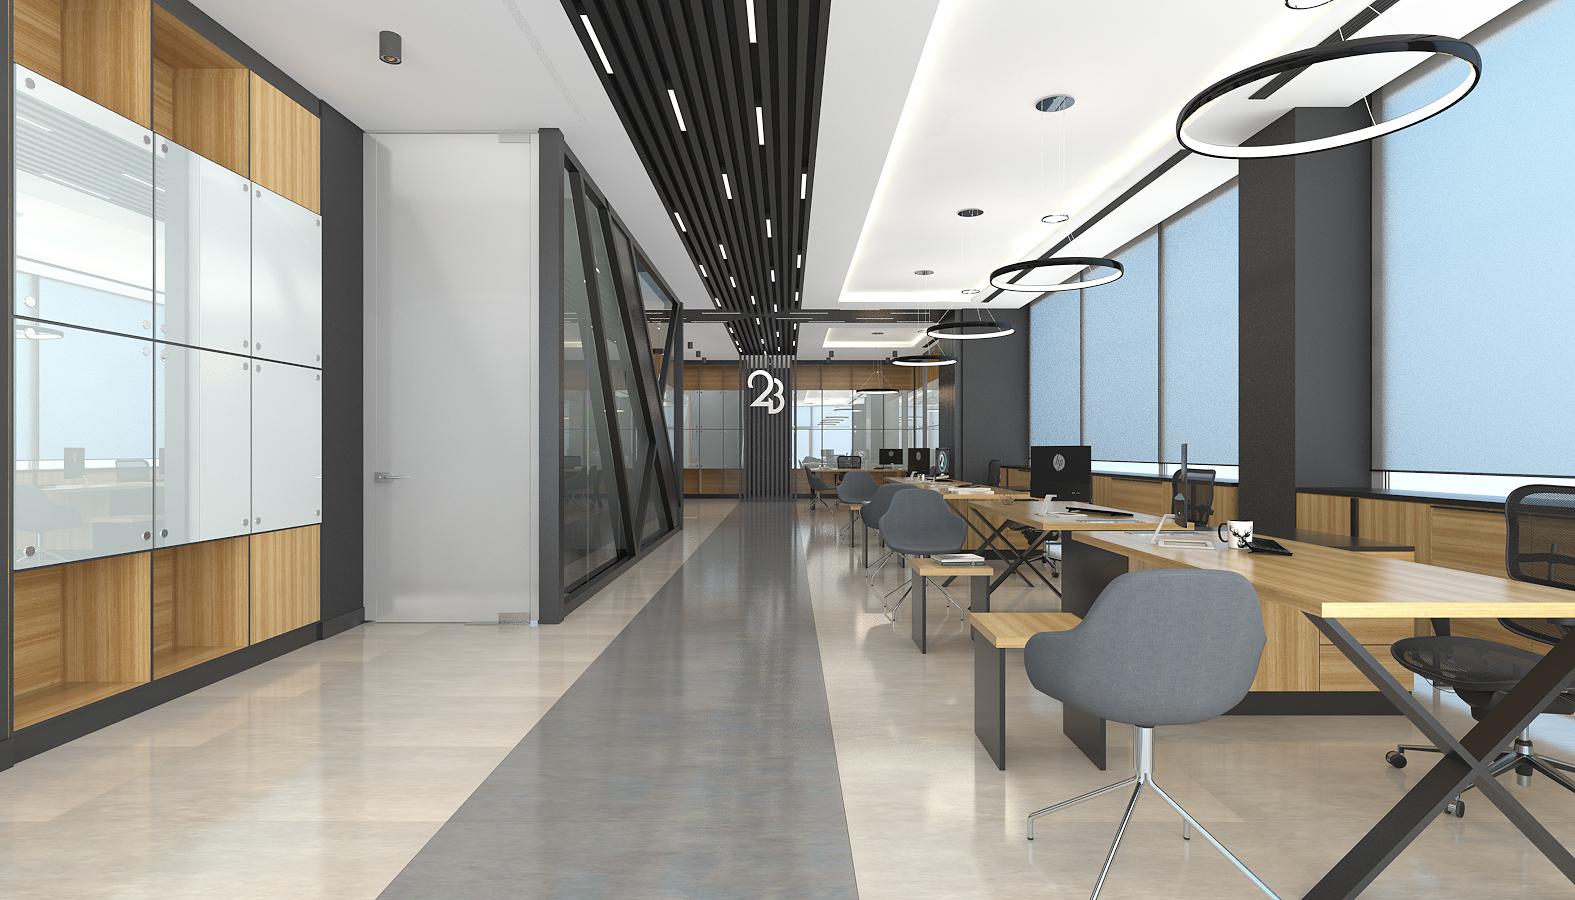 Retail Shop Design Interior Architecture 2B Energy